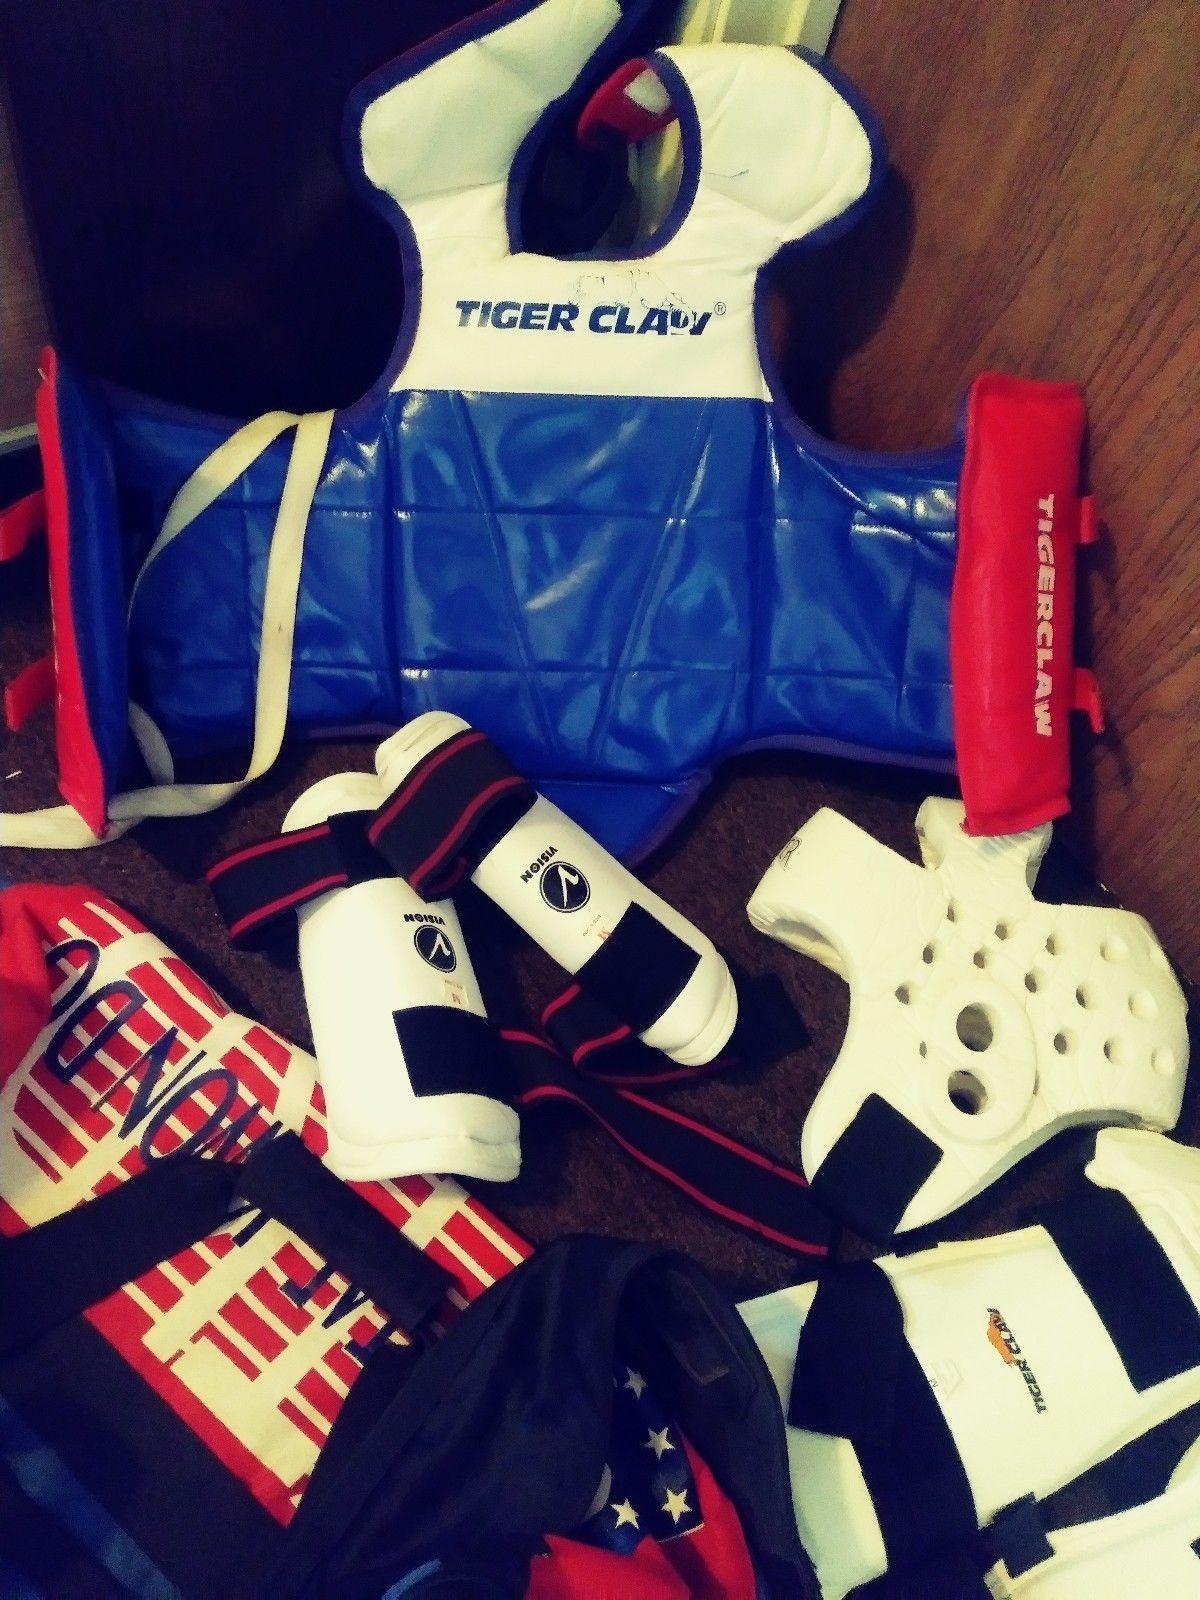 TIGER CLAW. ETC YOUTH MARTIAL ARTS KARATE, TAEKWONDO, MMA